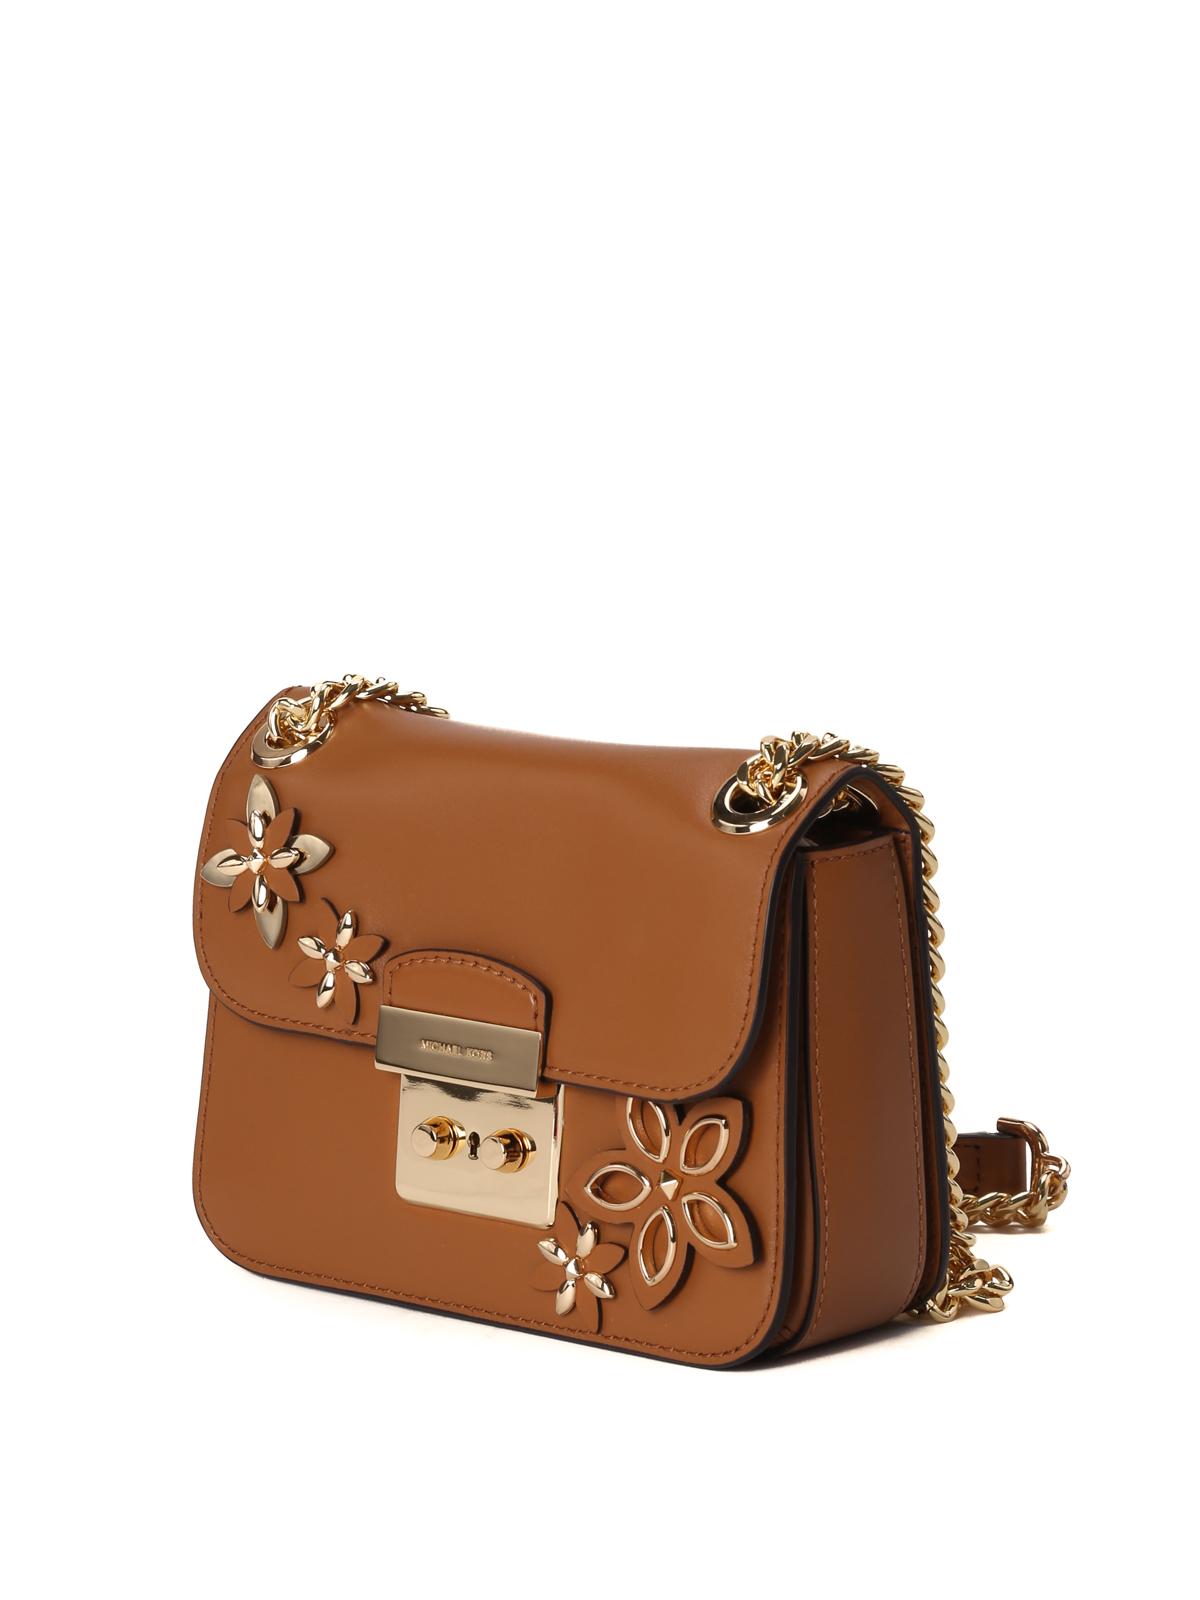 376174febe0b MICHAEL KORS: shoulder bags online - Sloan flower appliqué small bag